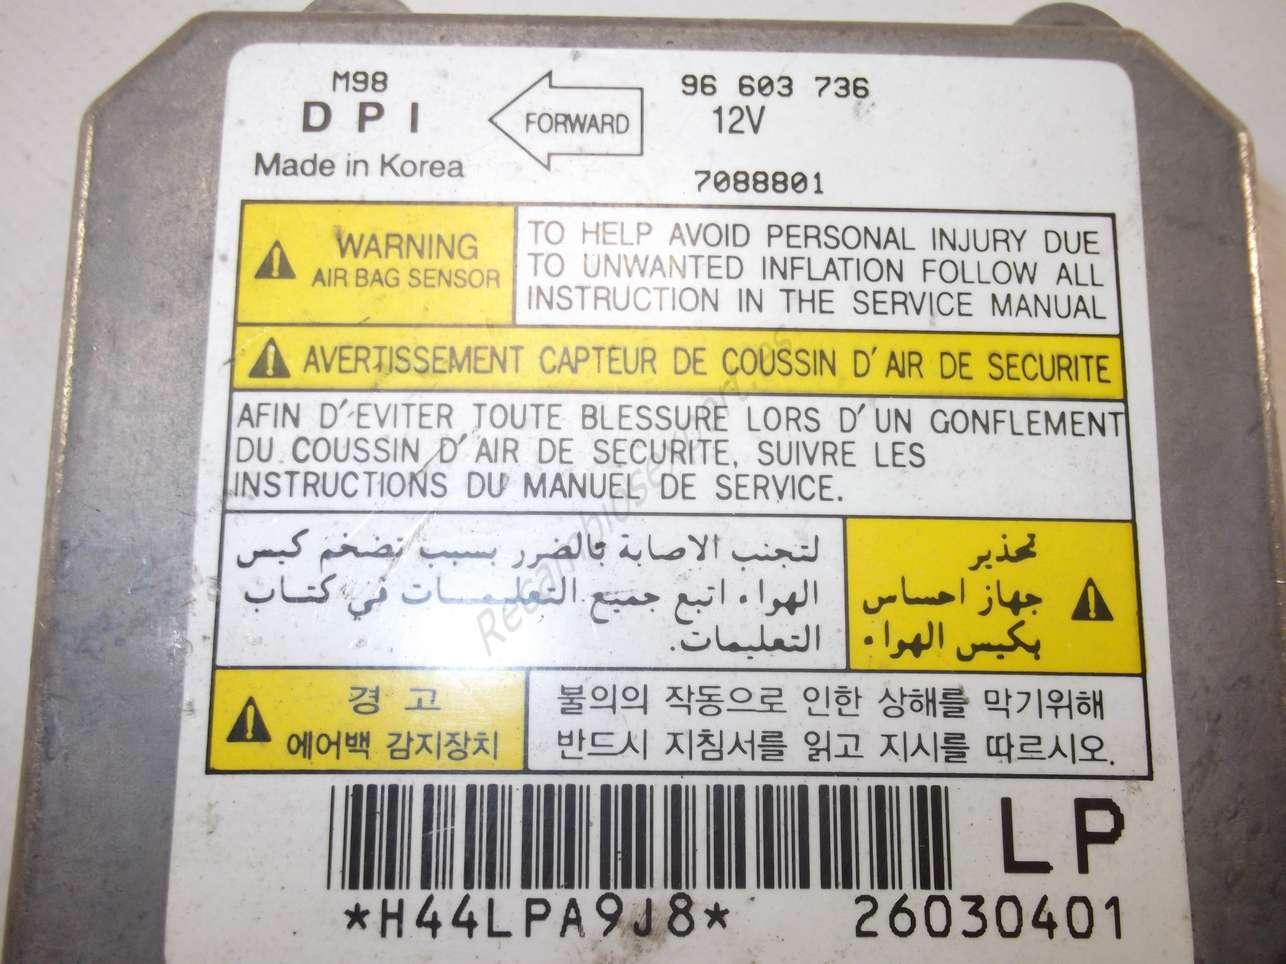 Centralita Airbag Daewoo Matiz 96 603 736 96603736 7088801 Manual